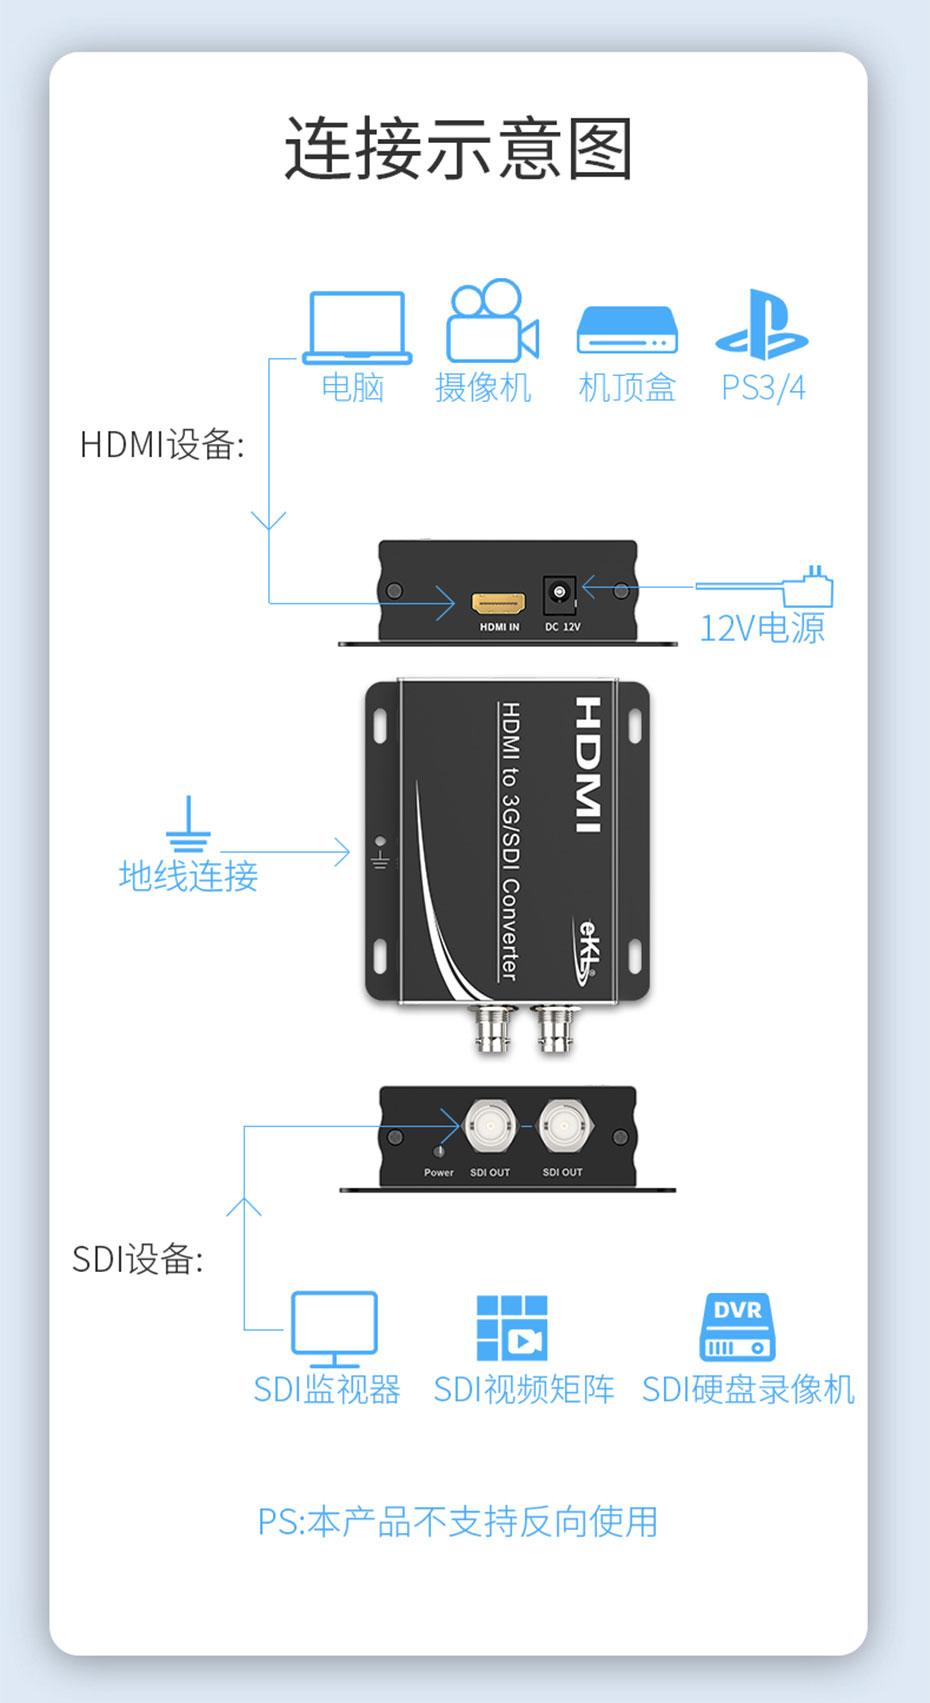 HDMI转SDI转换器HSD连接使用示意图